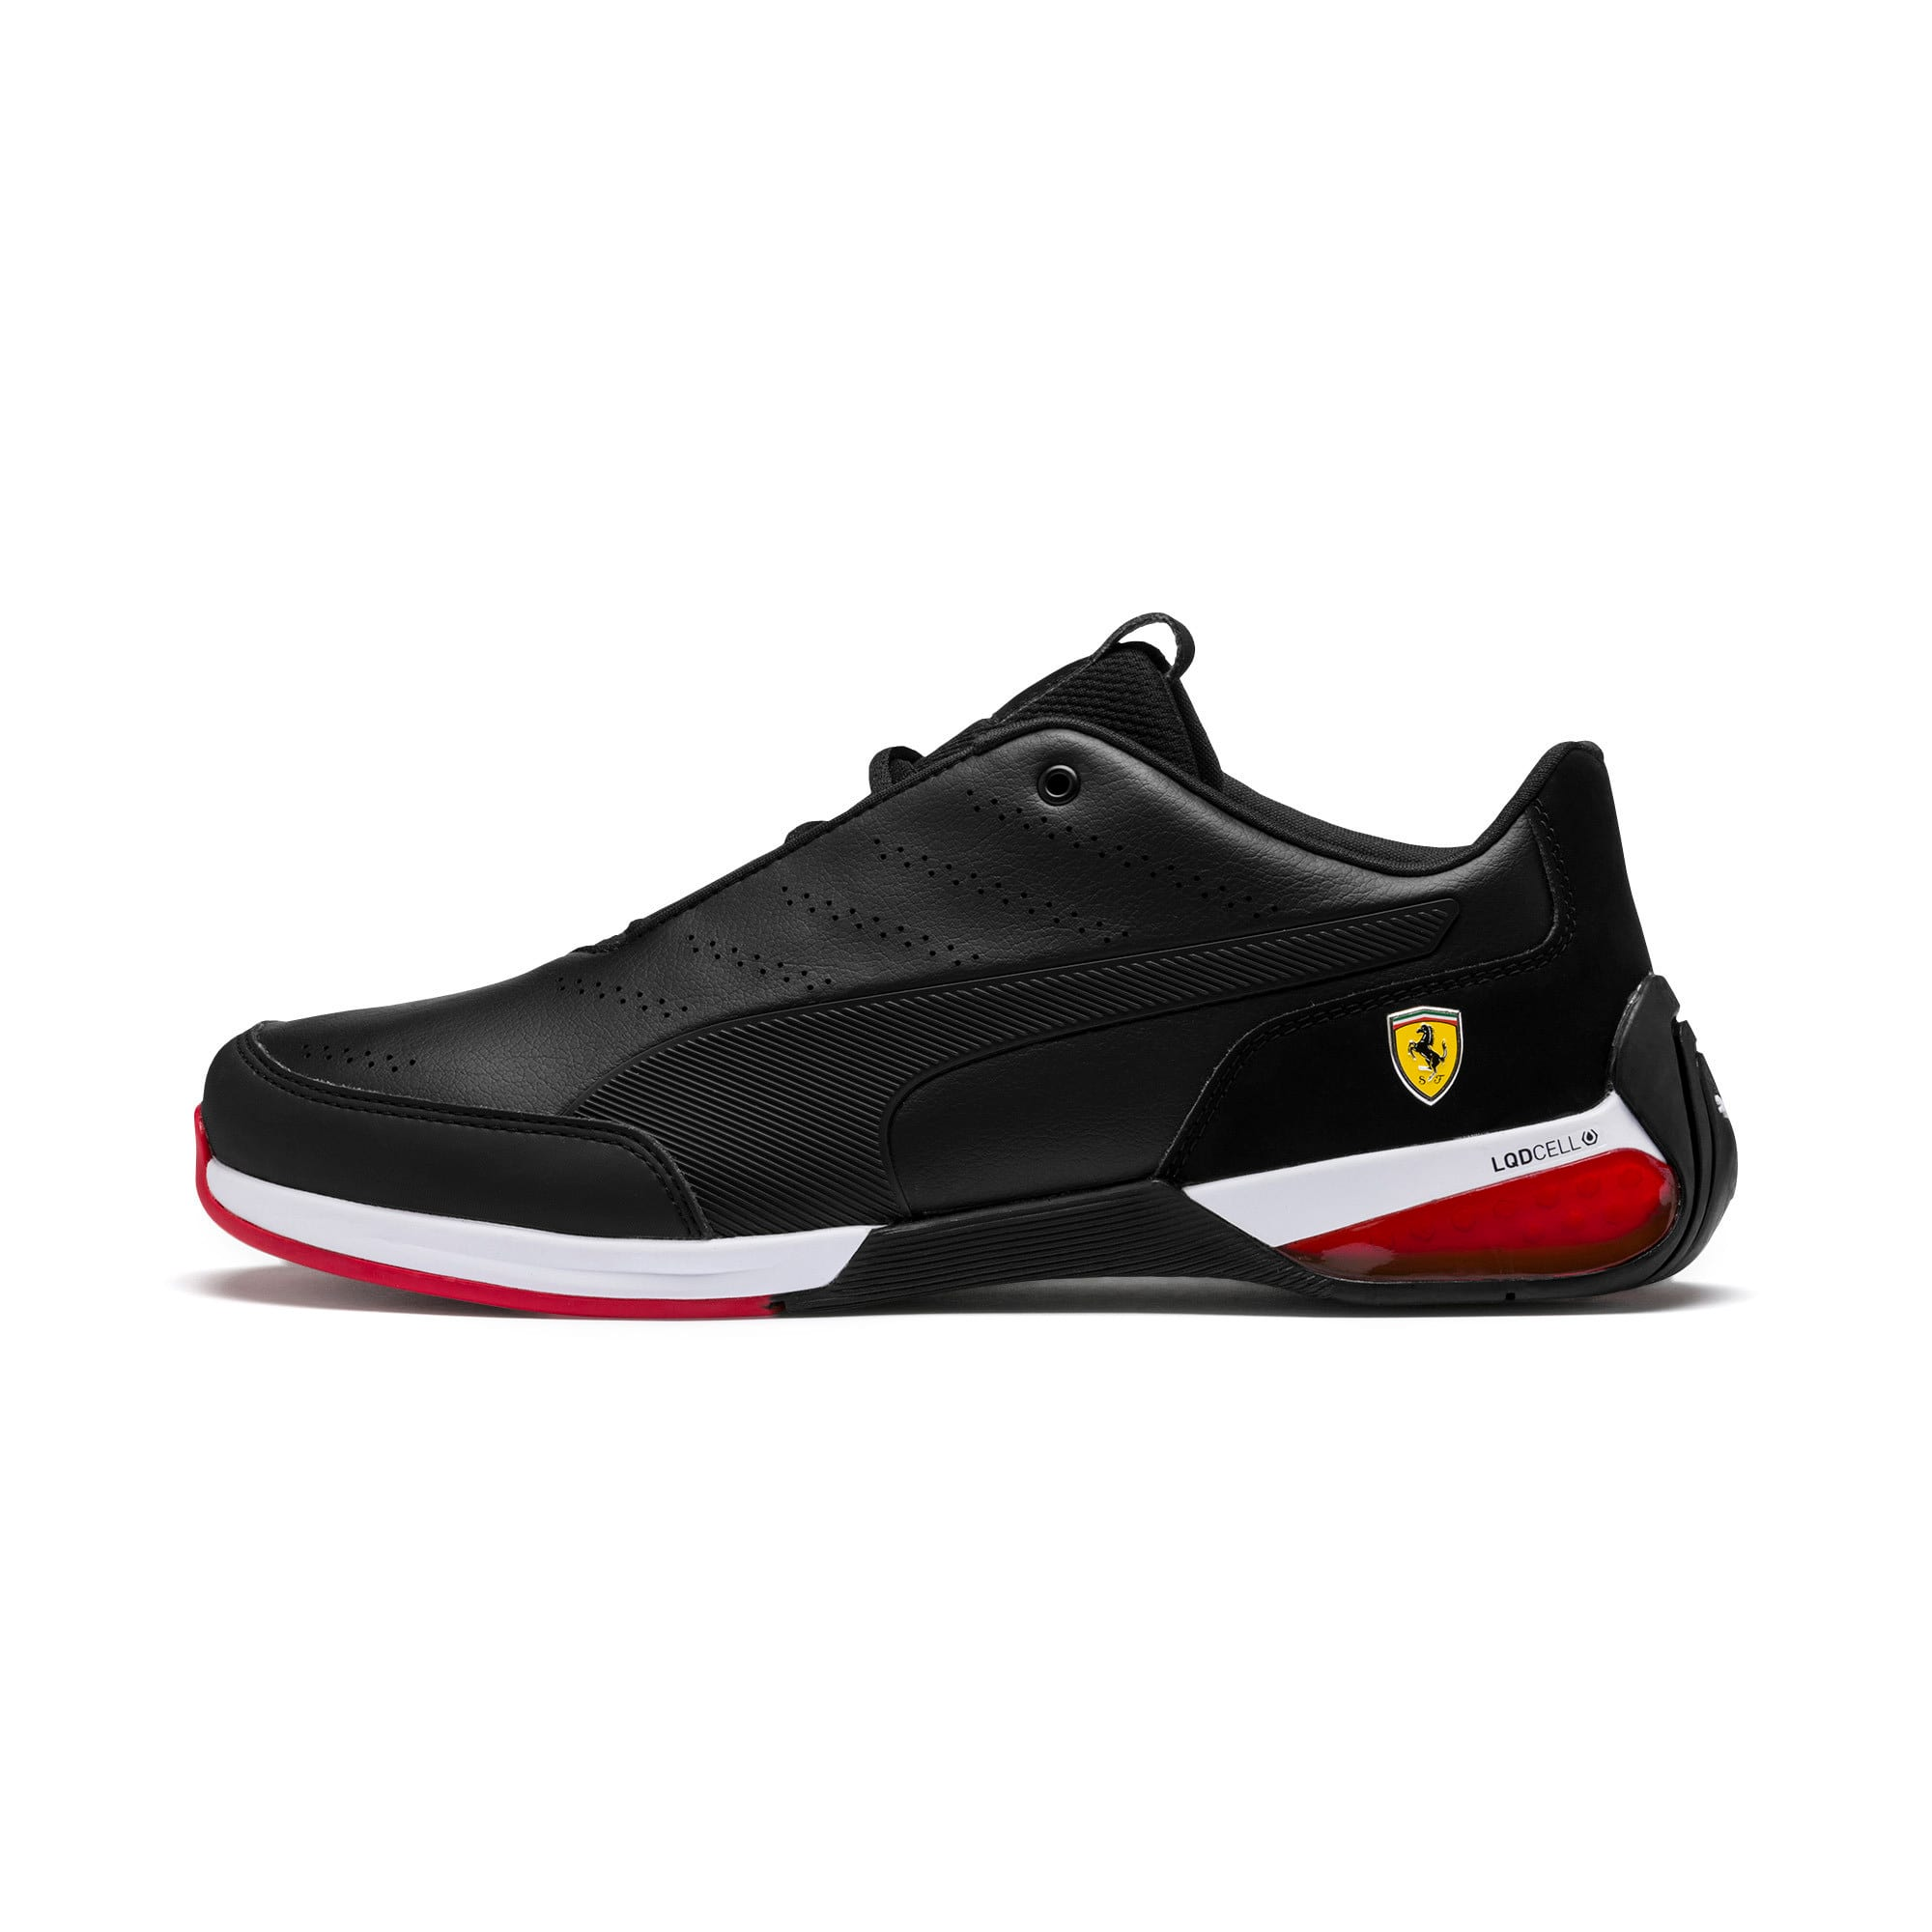 Thumbnail 1 of Scuderia Ferrari Kart Cat X Training Shoes, Puma Black-Puma Black, medium